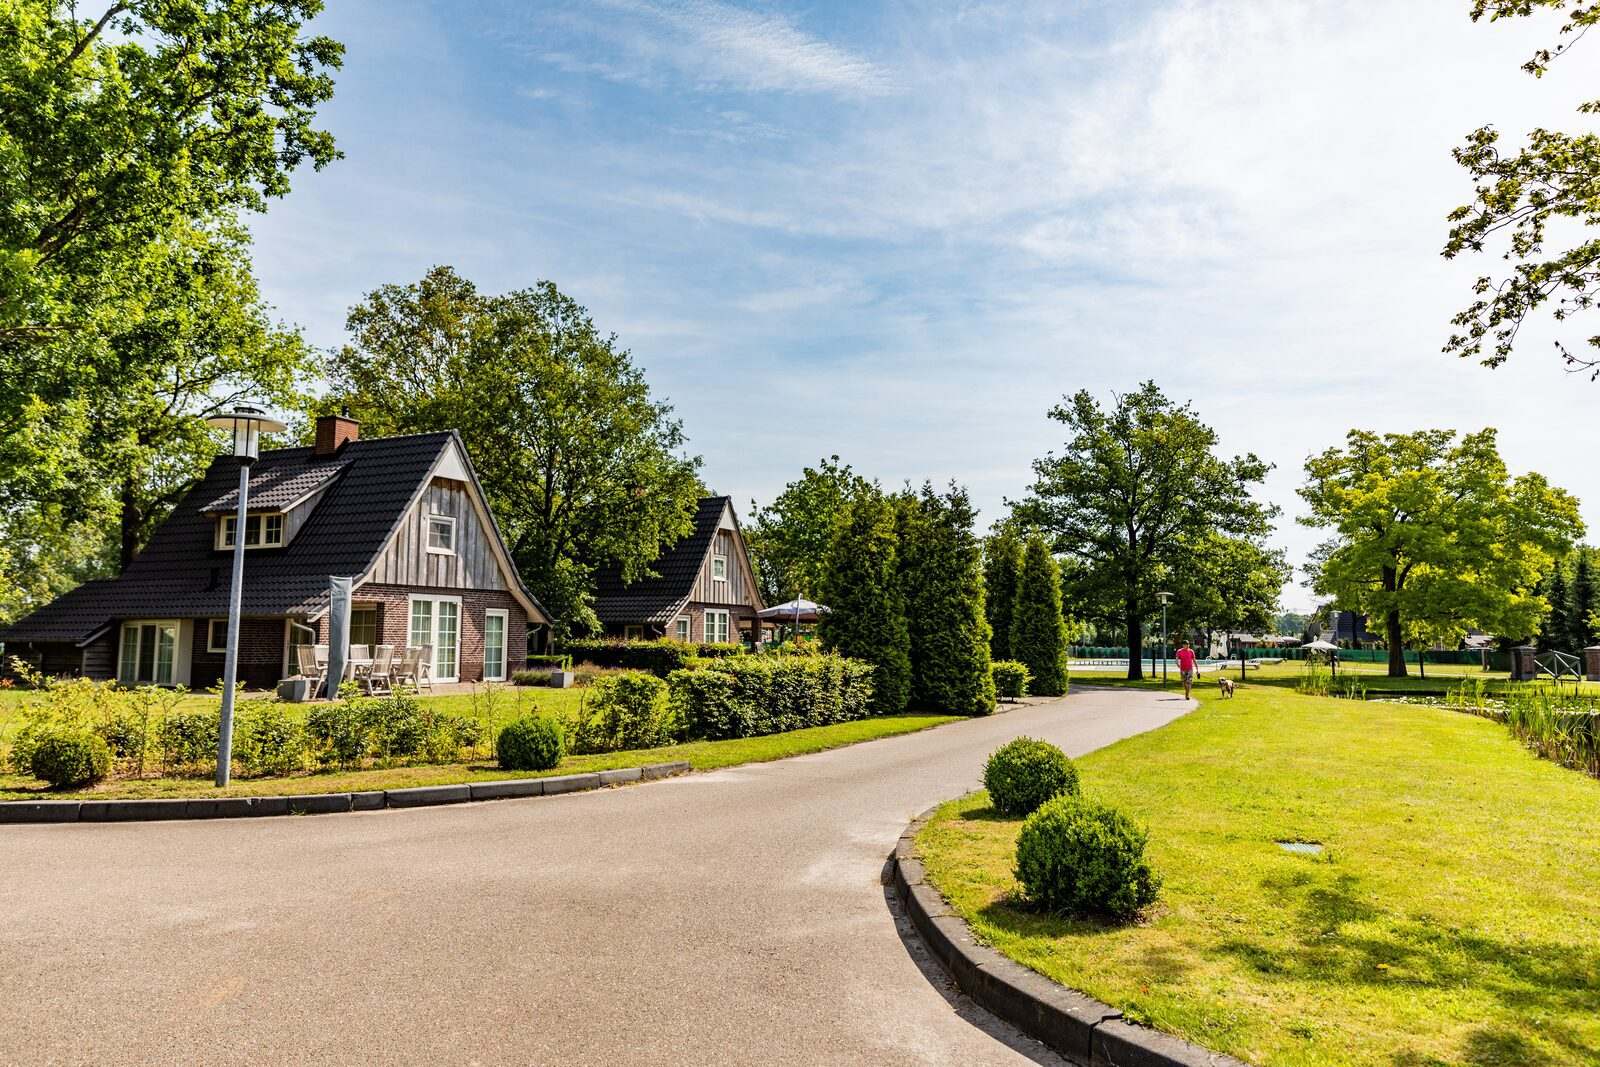 Ferienpark Nijverdal